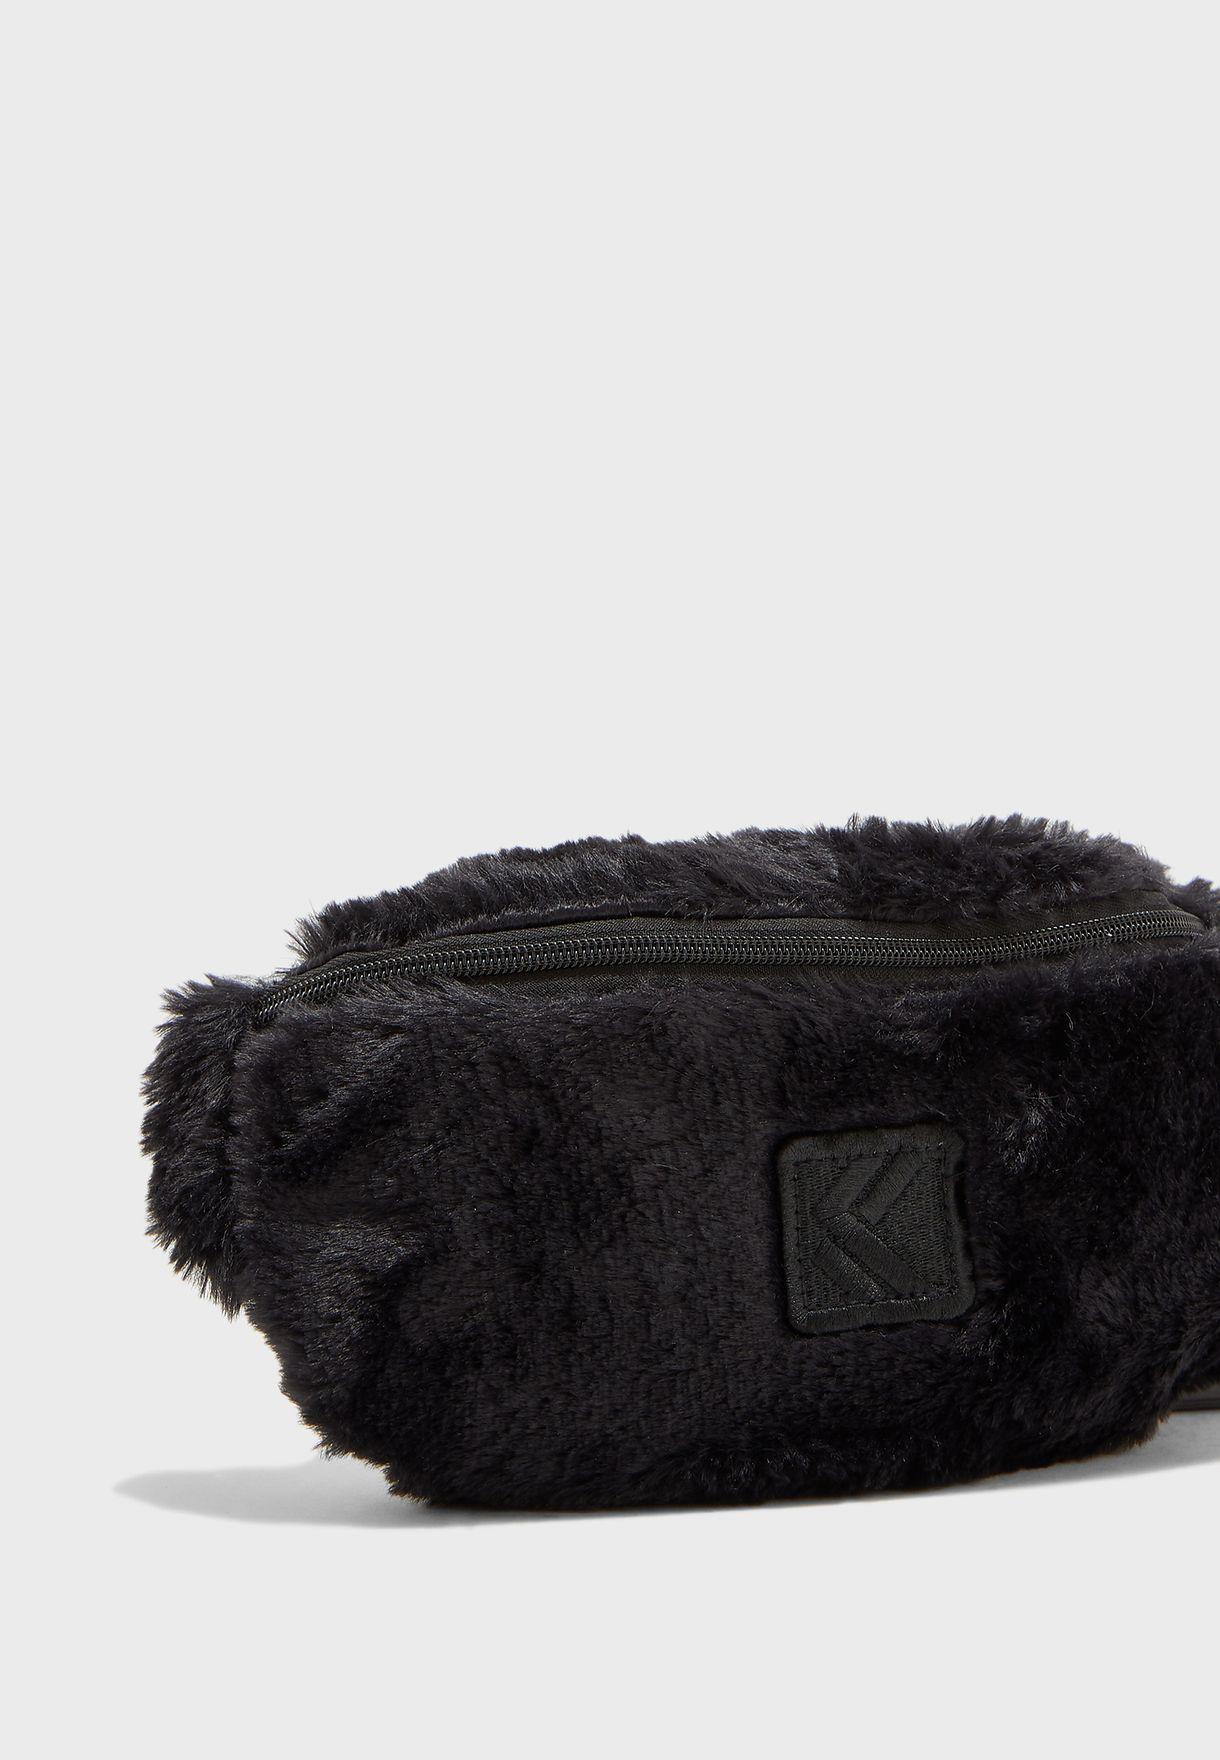 Fake Fur Waistbag